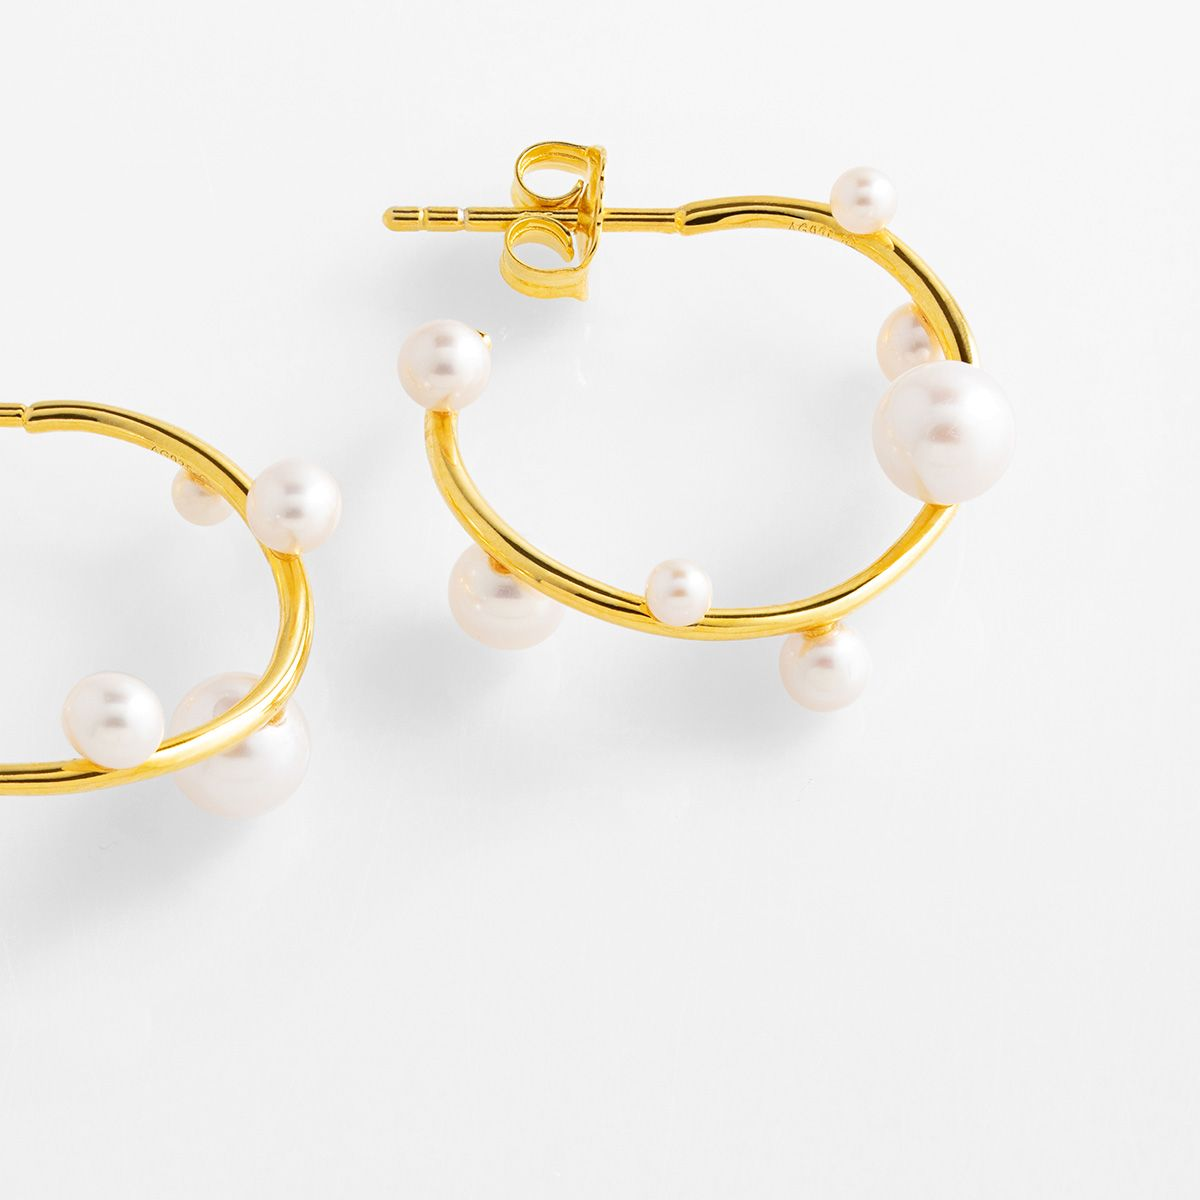 Lana - Perlenohrringe - Gold